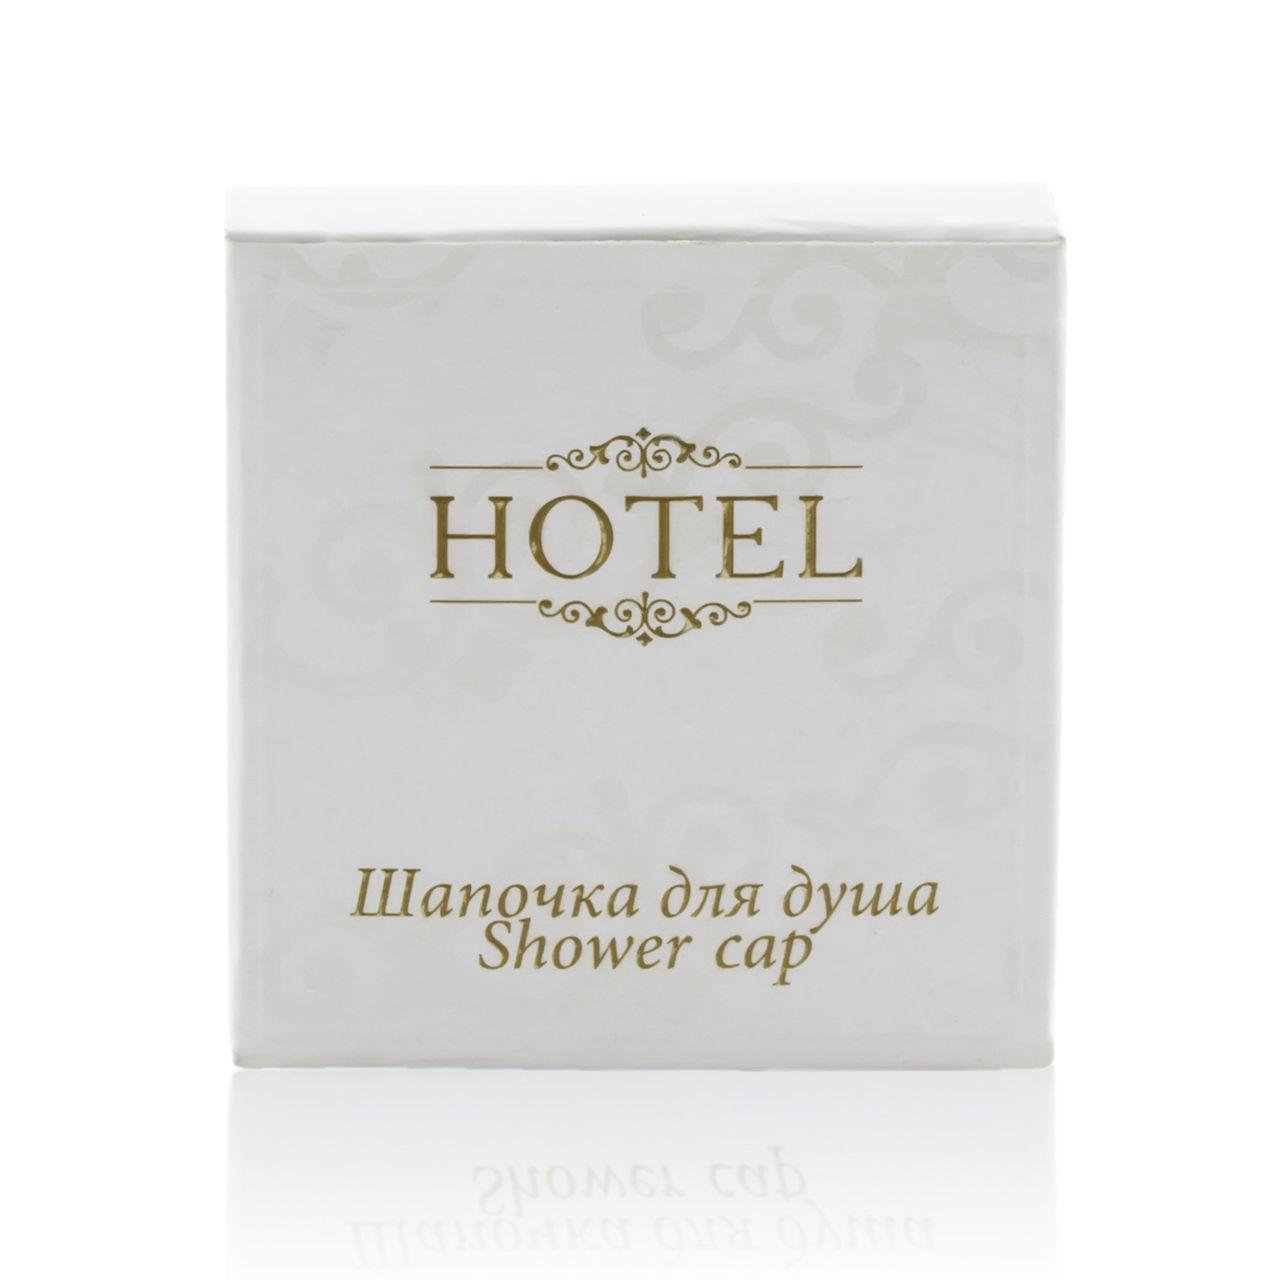 Шапочка для душа Hotel в картоне